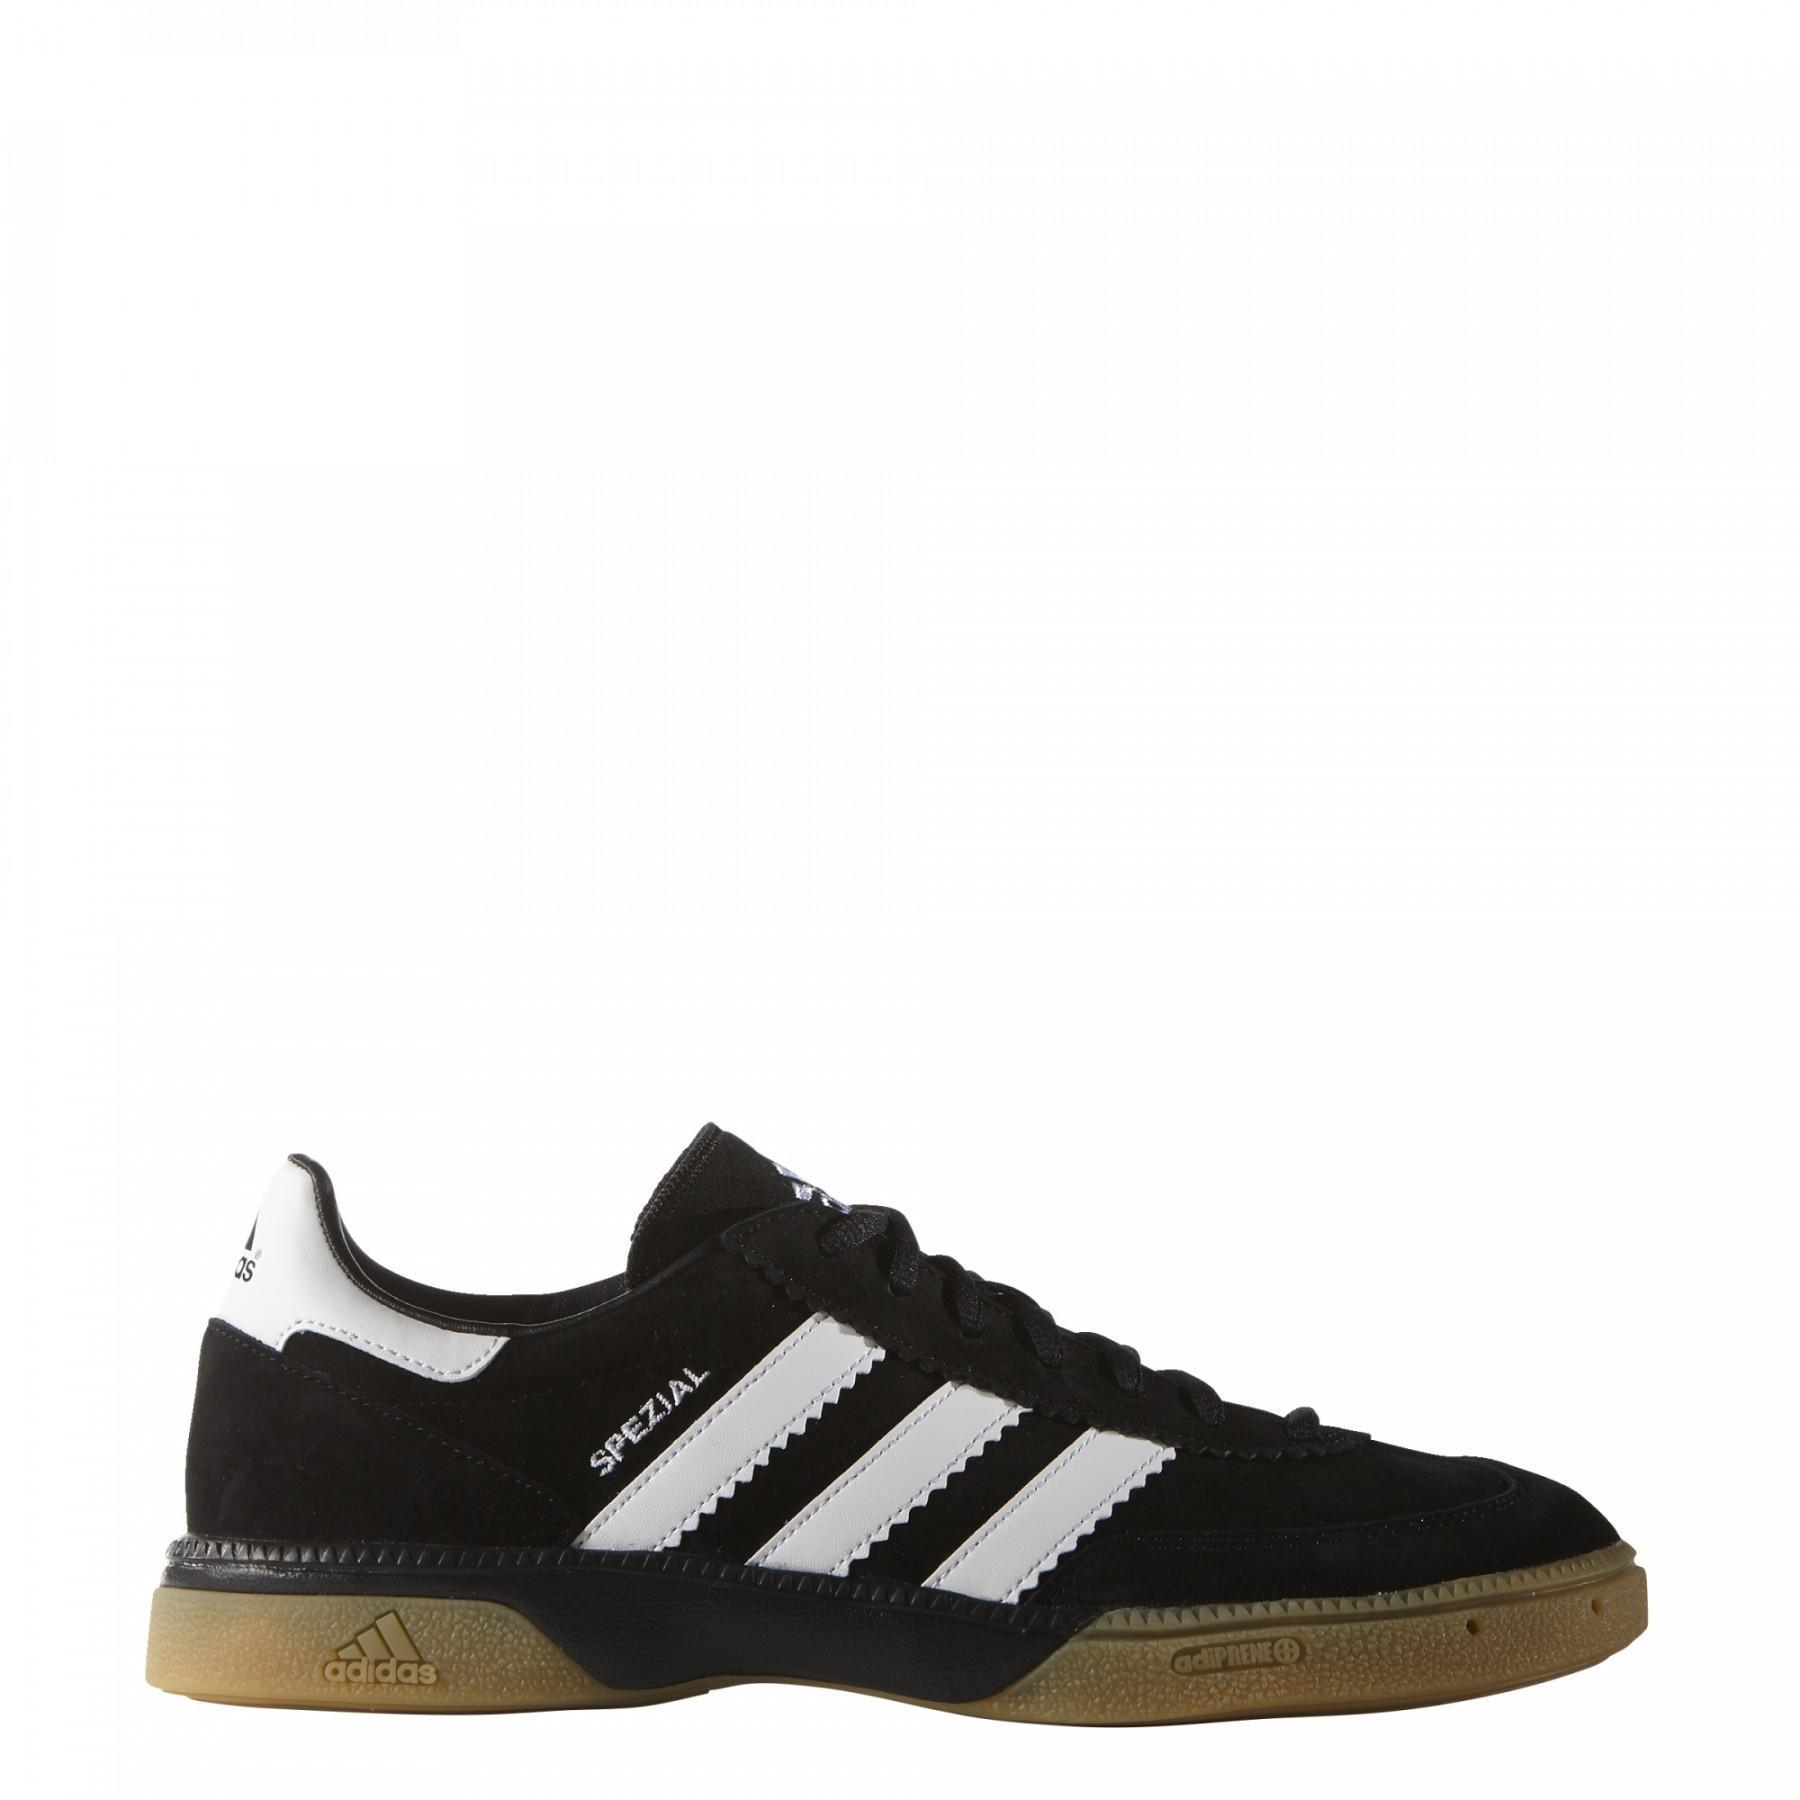 Schoenen adidas HB Spezial Noir